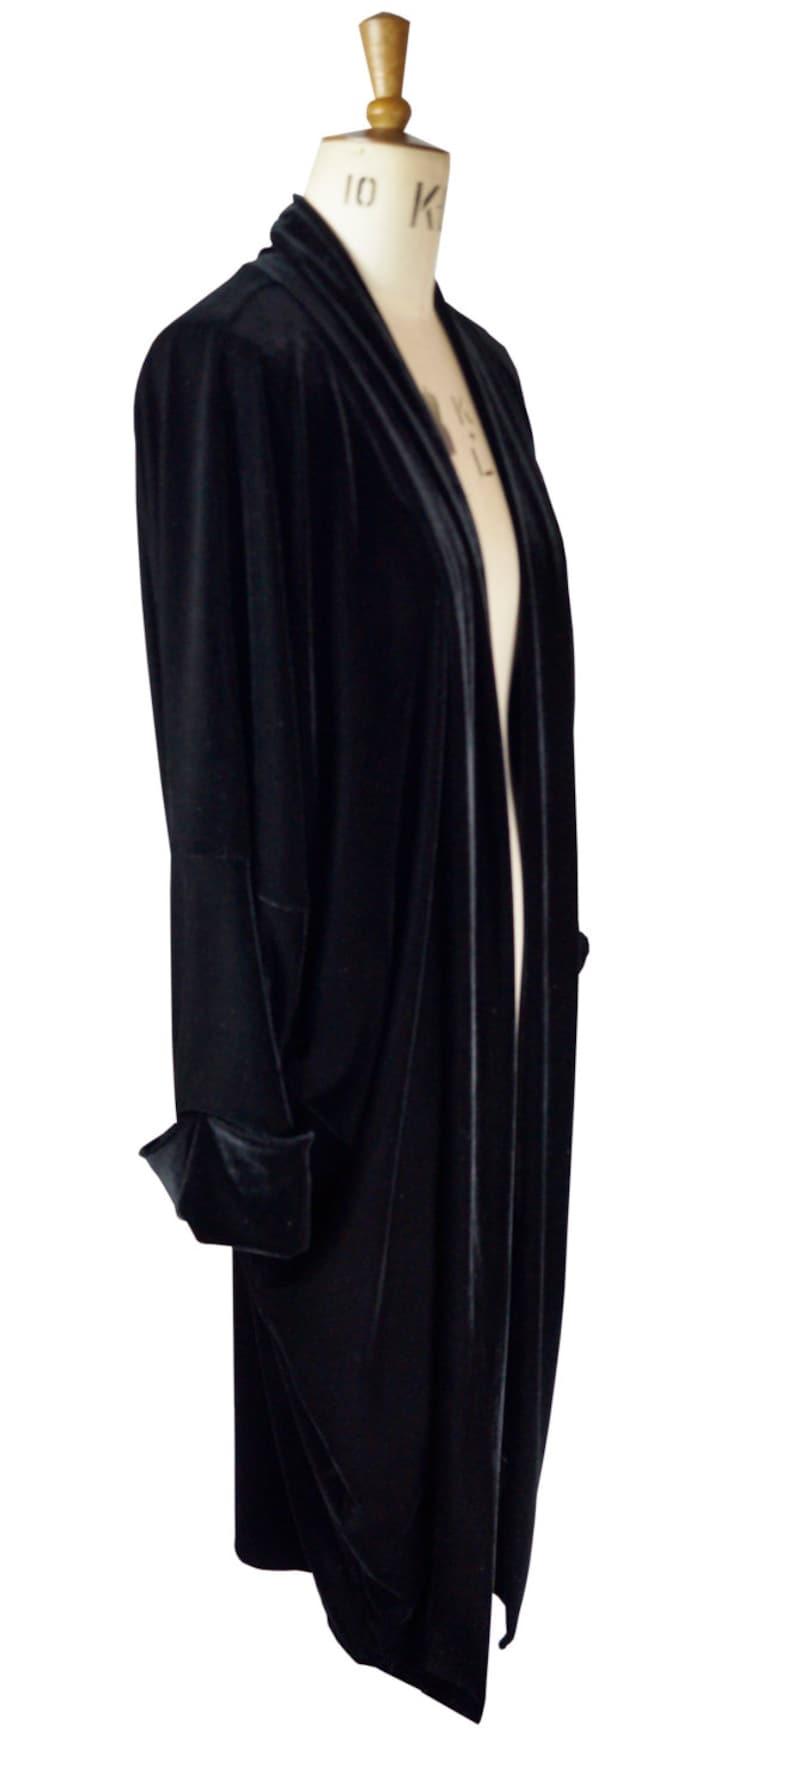 Shawls & Wraps | Fur Stole, Lace, Fringe Baylis and Knight Black Velvet Duster Coat Opera $101.12 AT vintagedancer.com